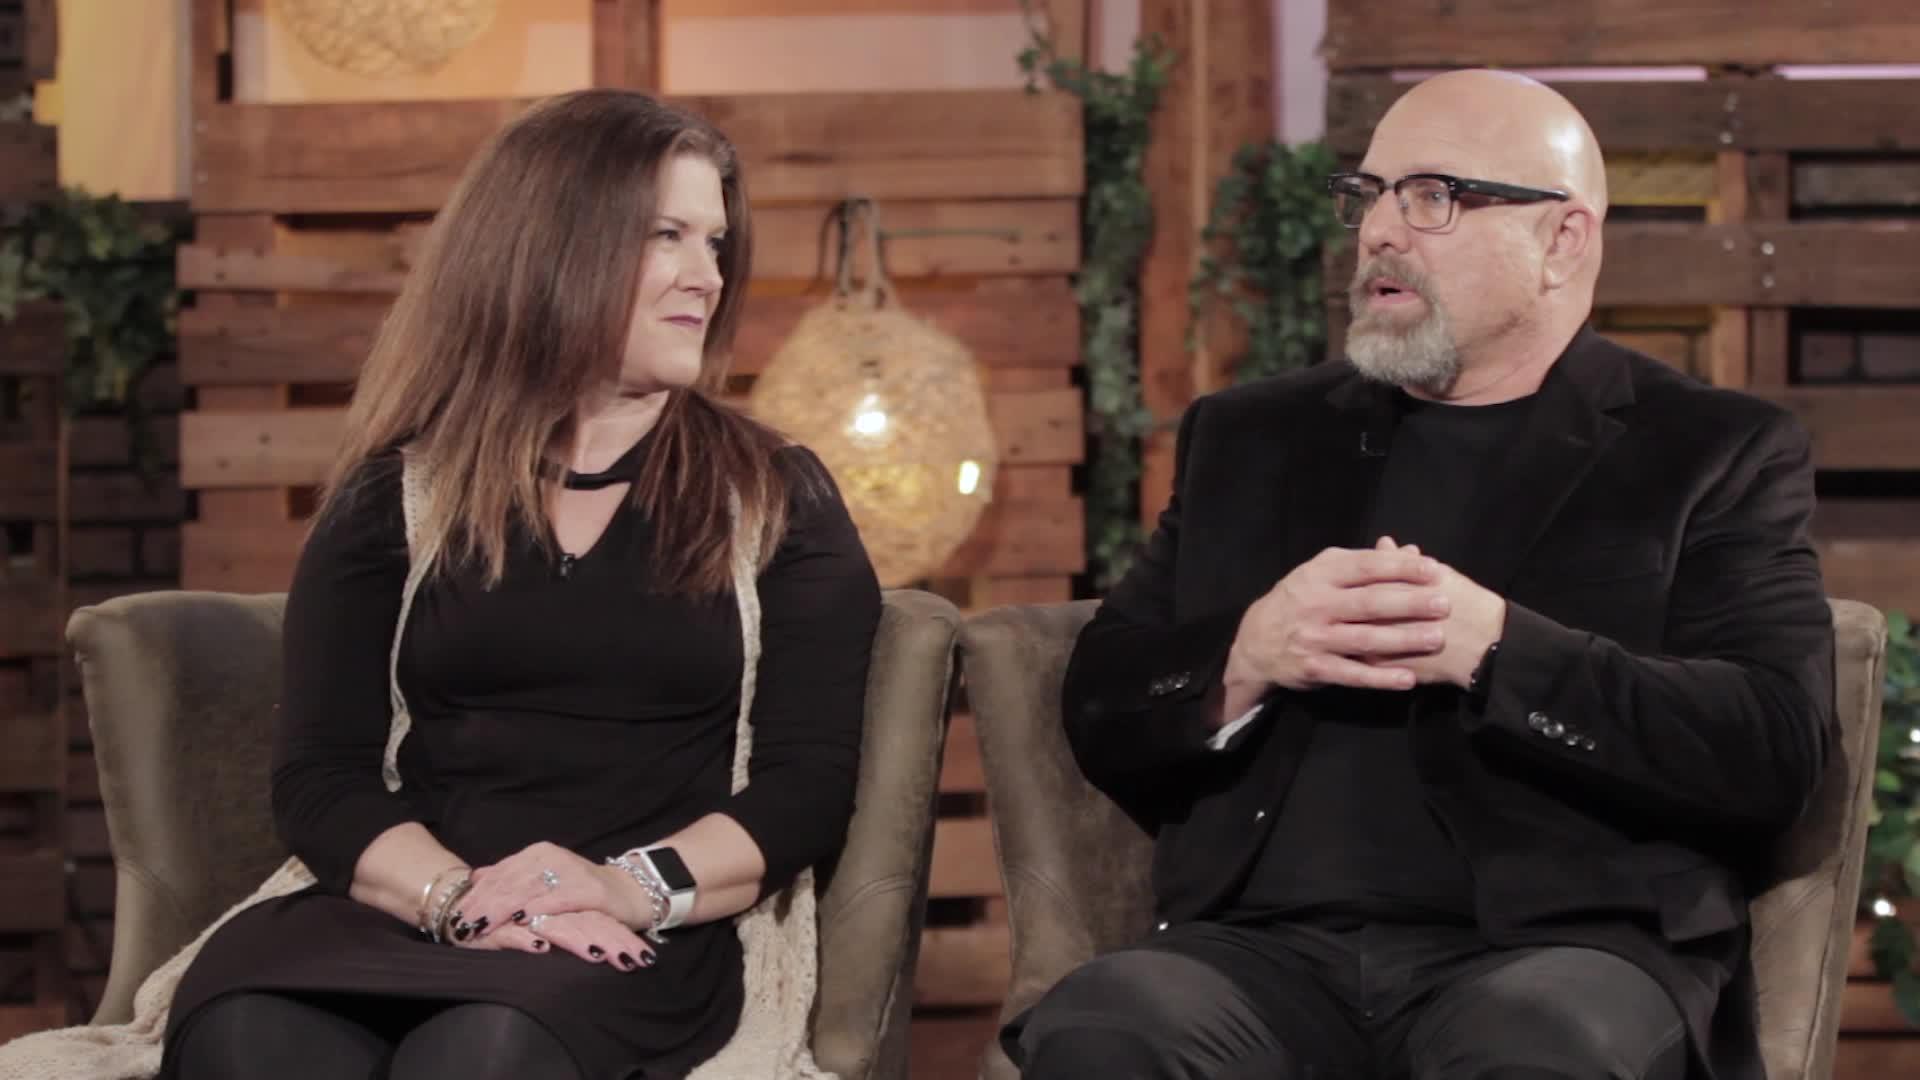 Matt and Martha Fry: A Child Of God